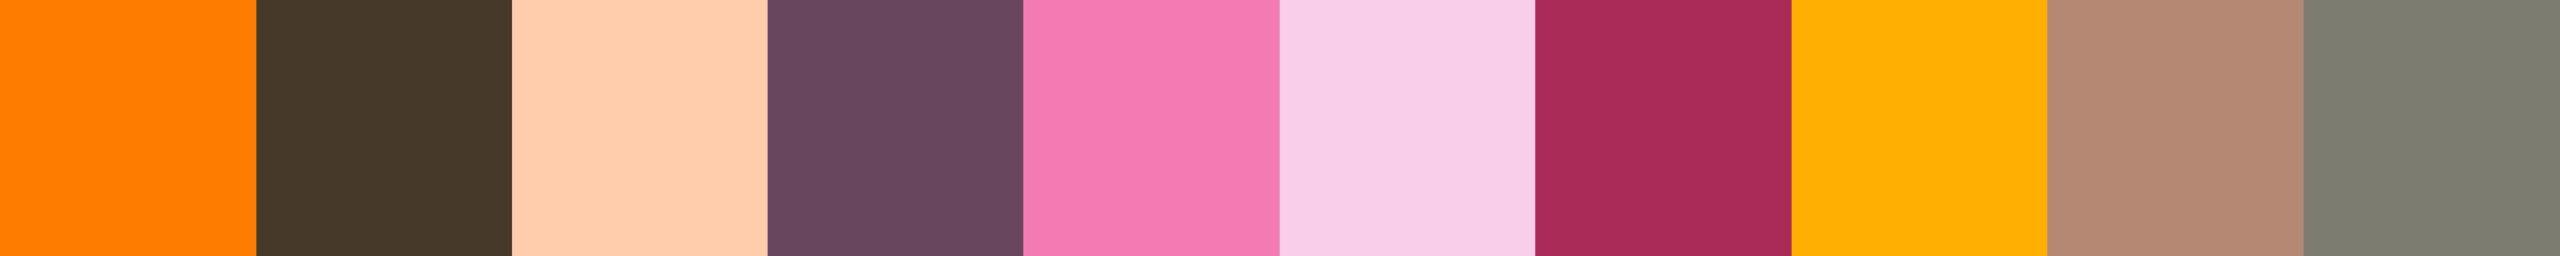 225 Sachexia Color Palette